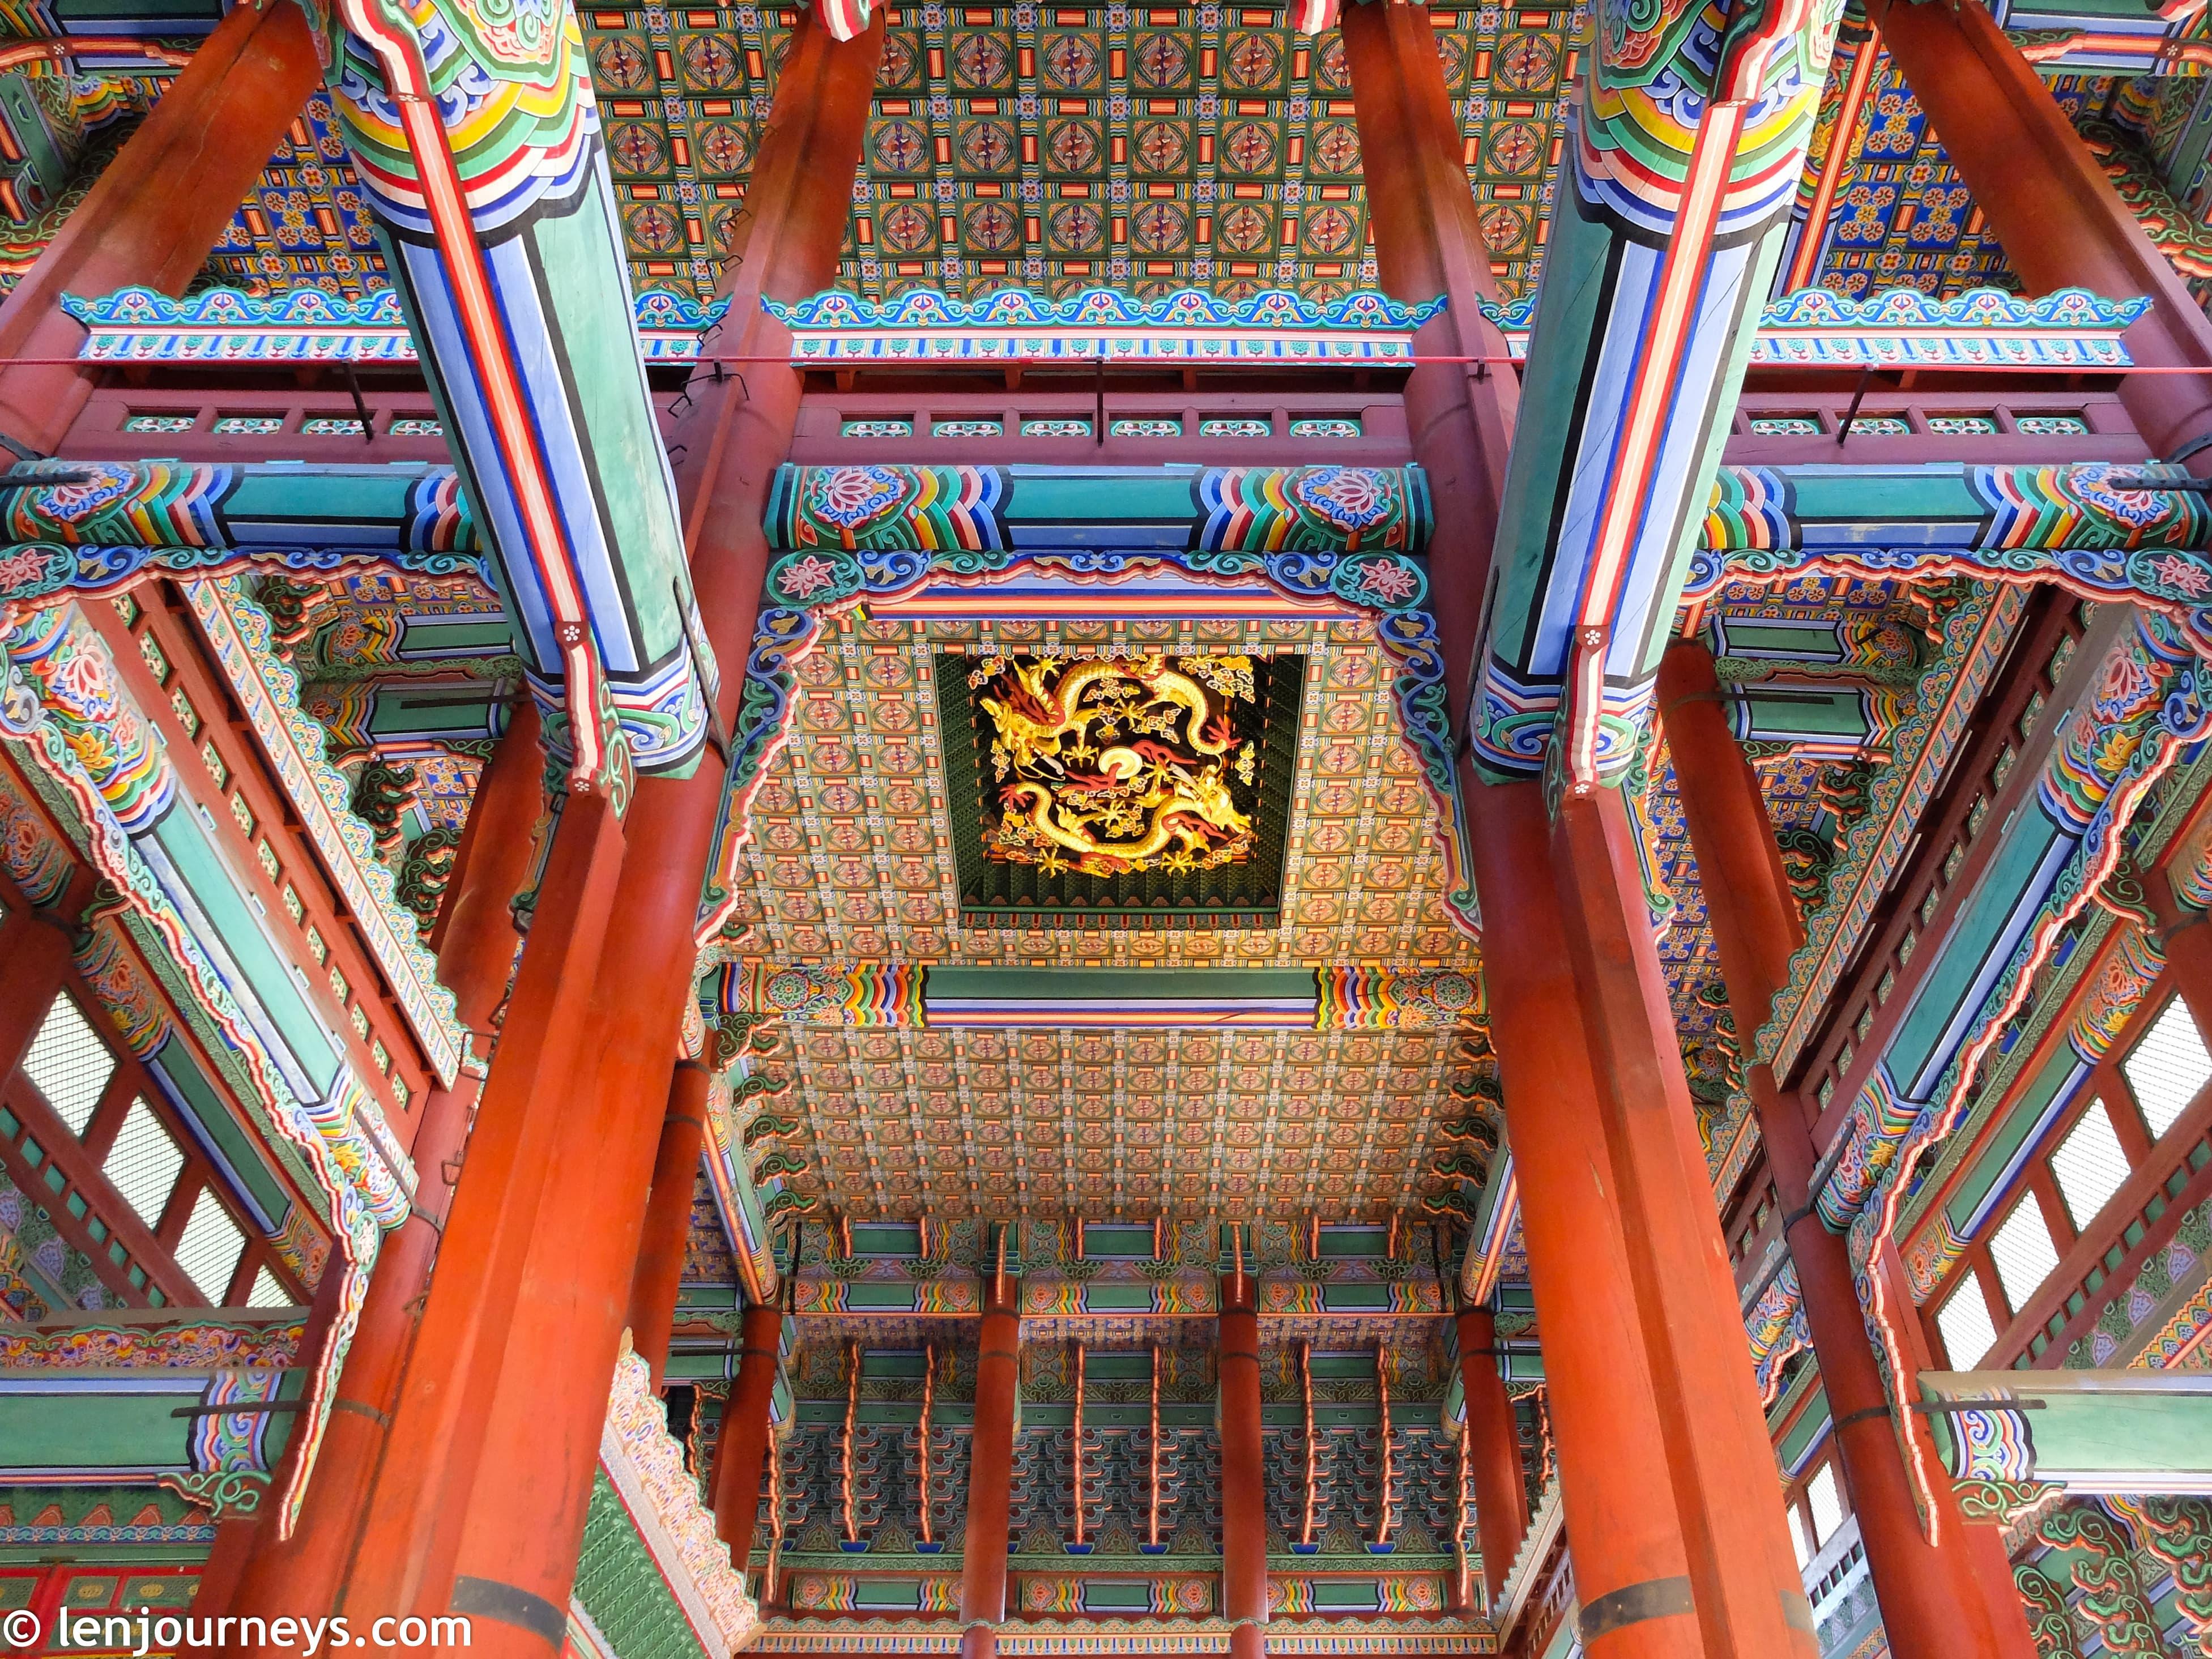 The throne room of Joseon Kings, Gyongbokgung